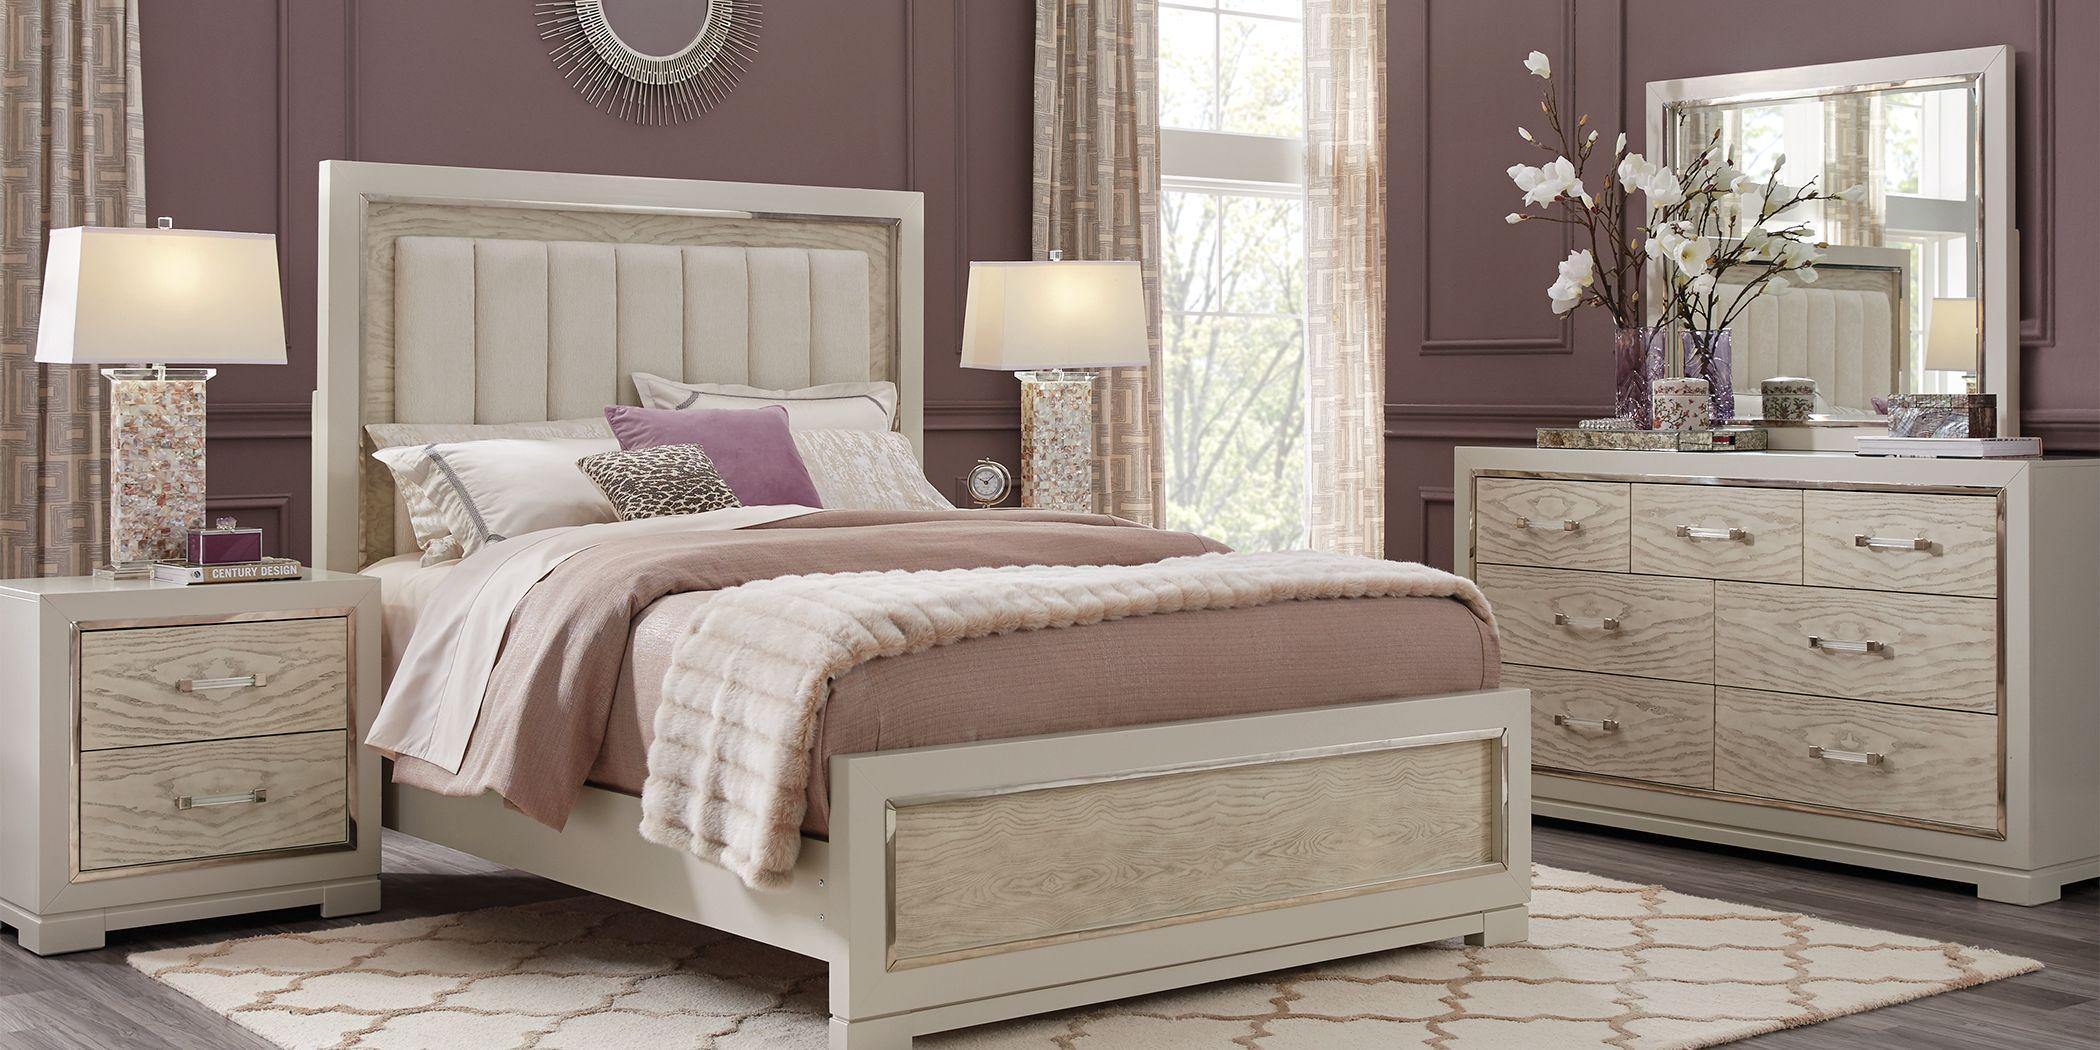 Cindy Crawford Home Bel Air Ivory 7 Pc King Panel Bedroom